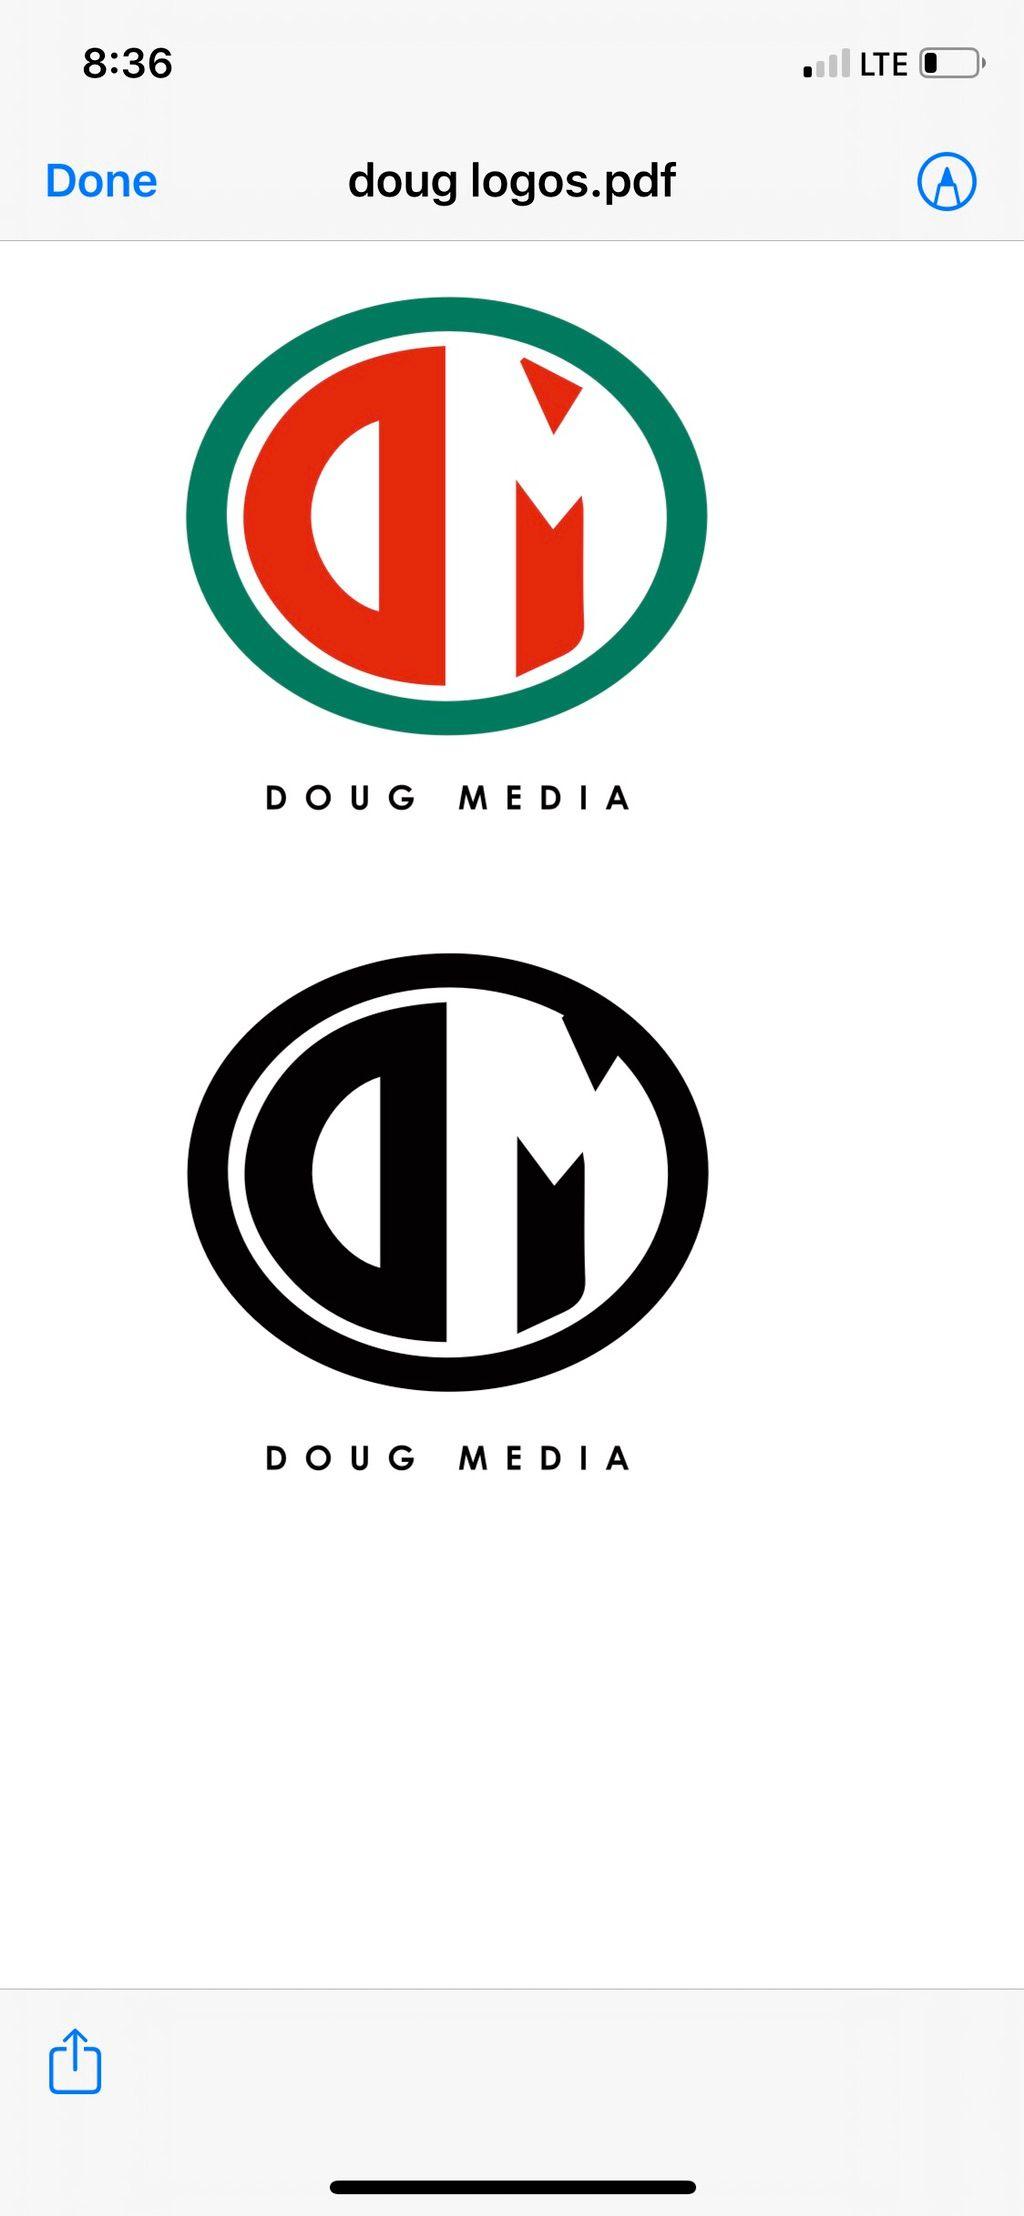 Doug Media LLC